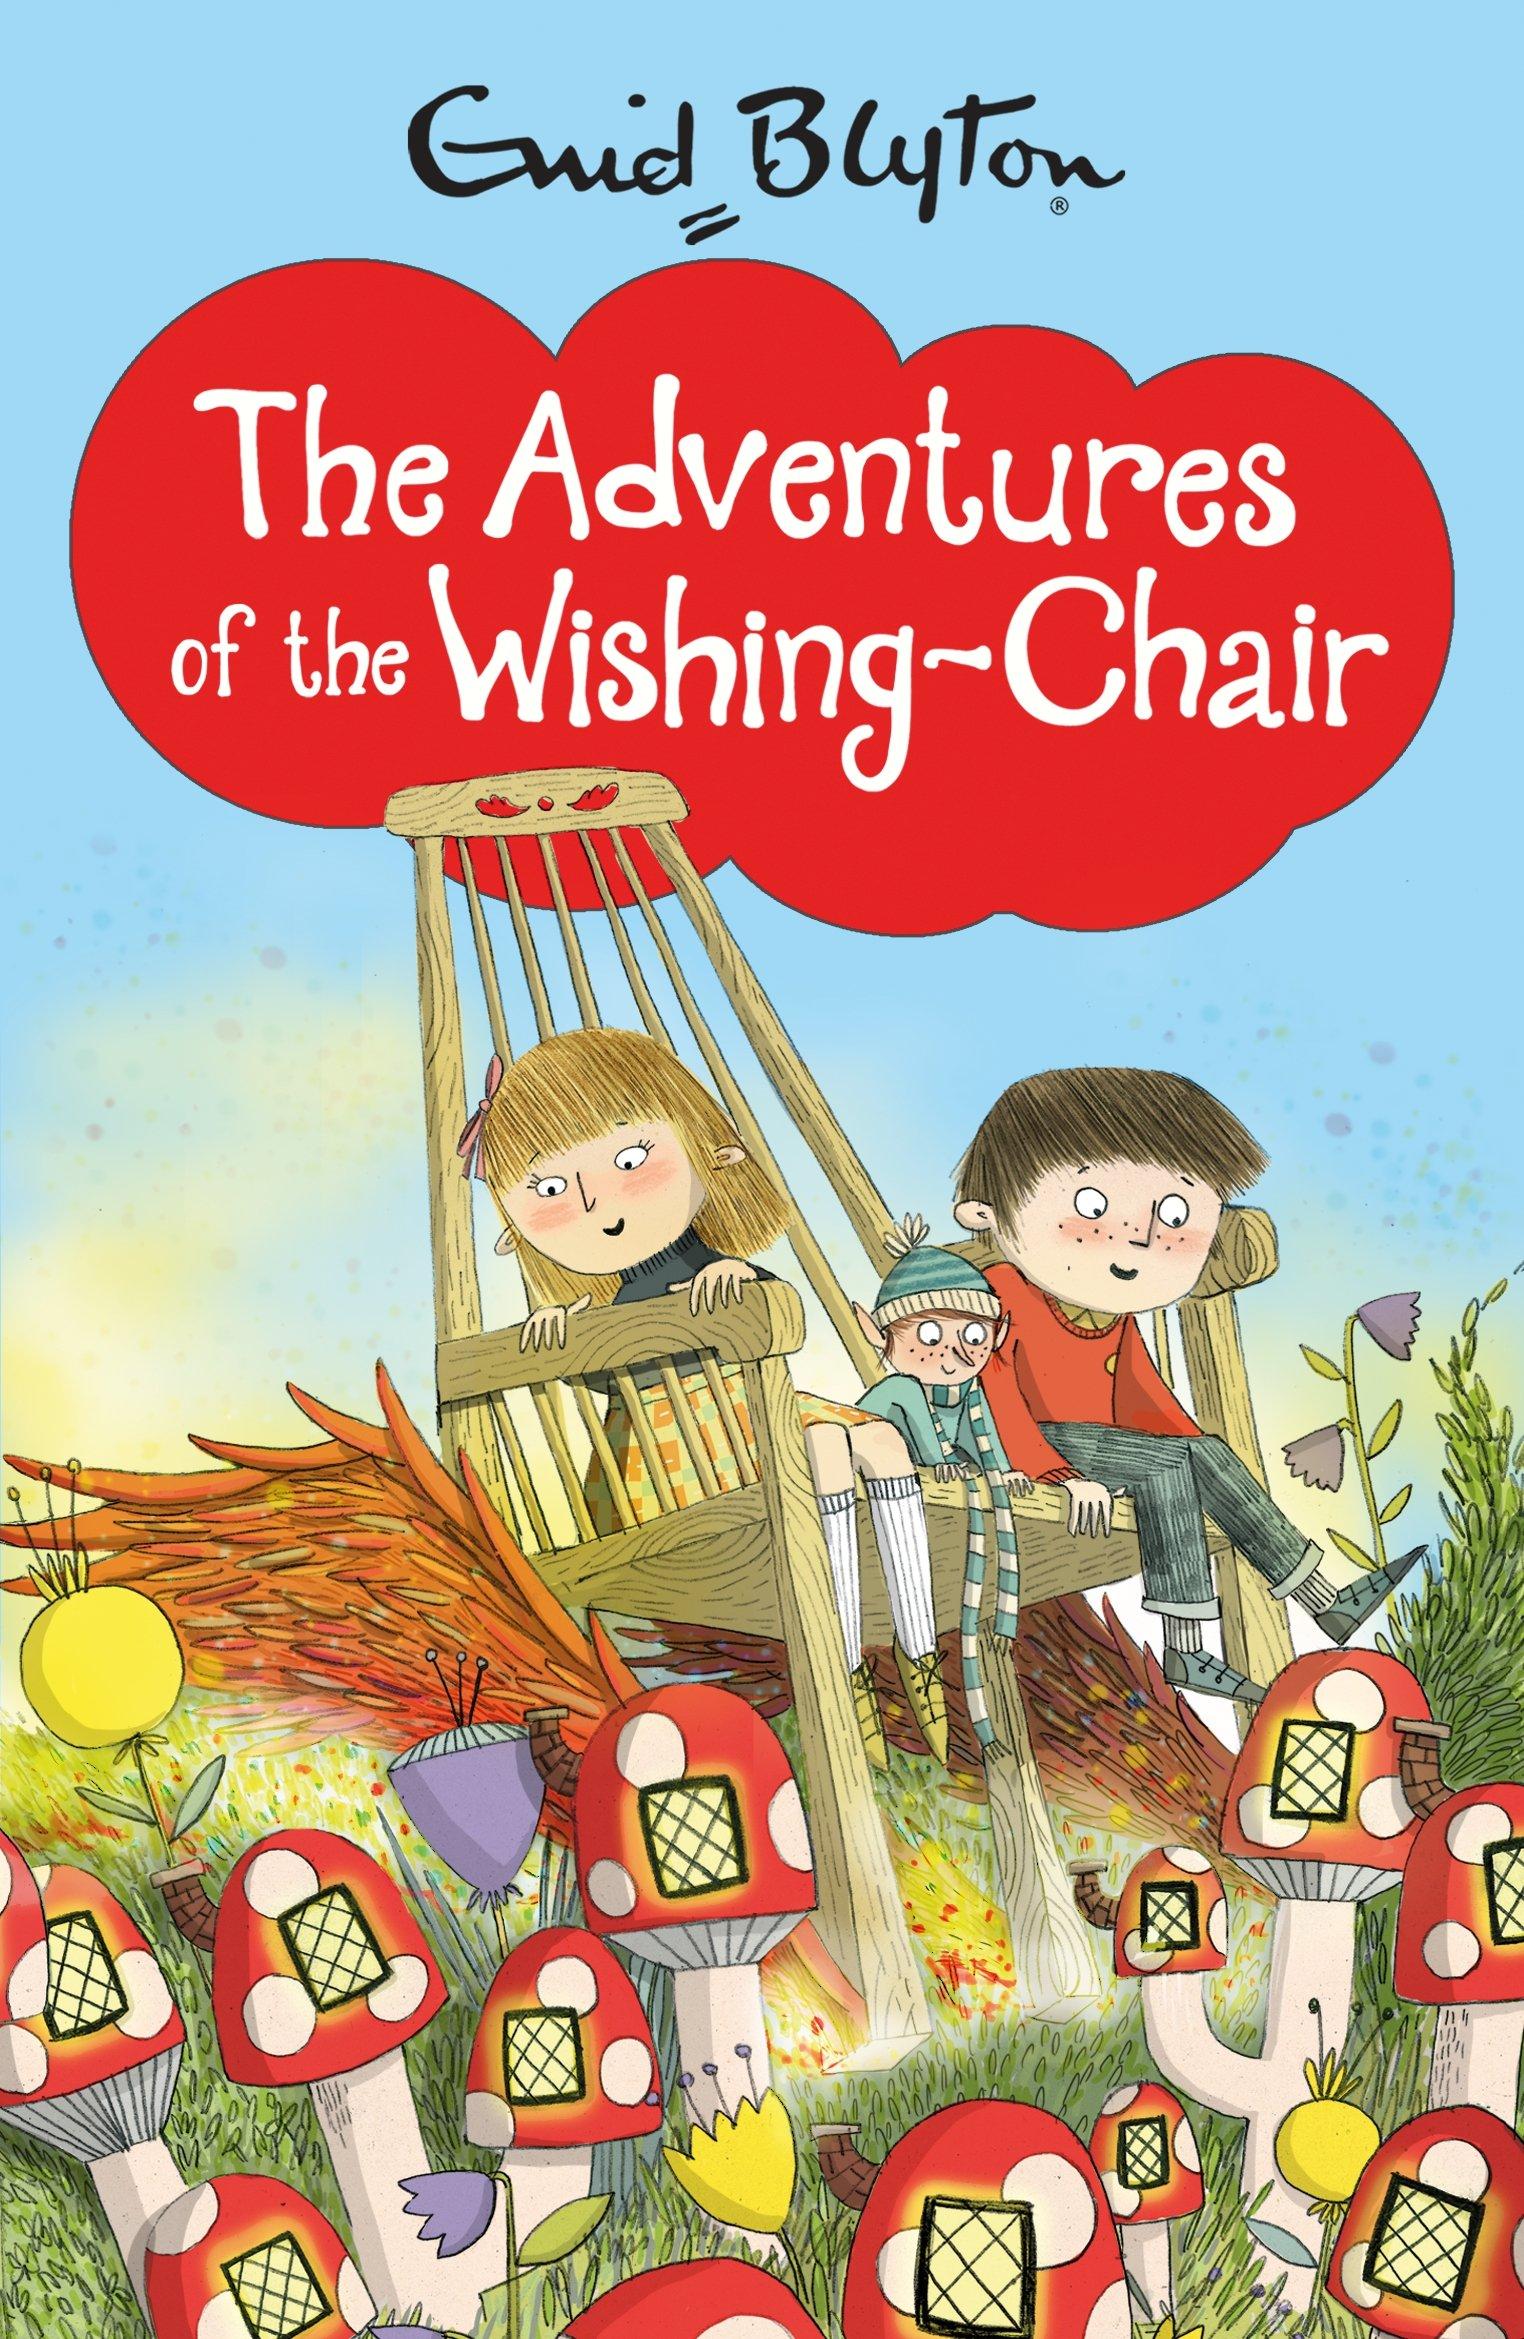 The Adventures of the Wishing-Chair : Blyton, Enid, Beech, Mark: Amazon.co.uk: Books